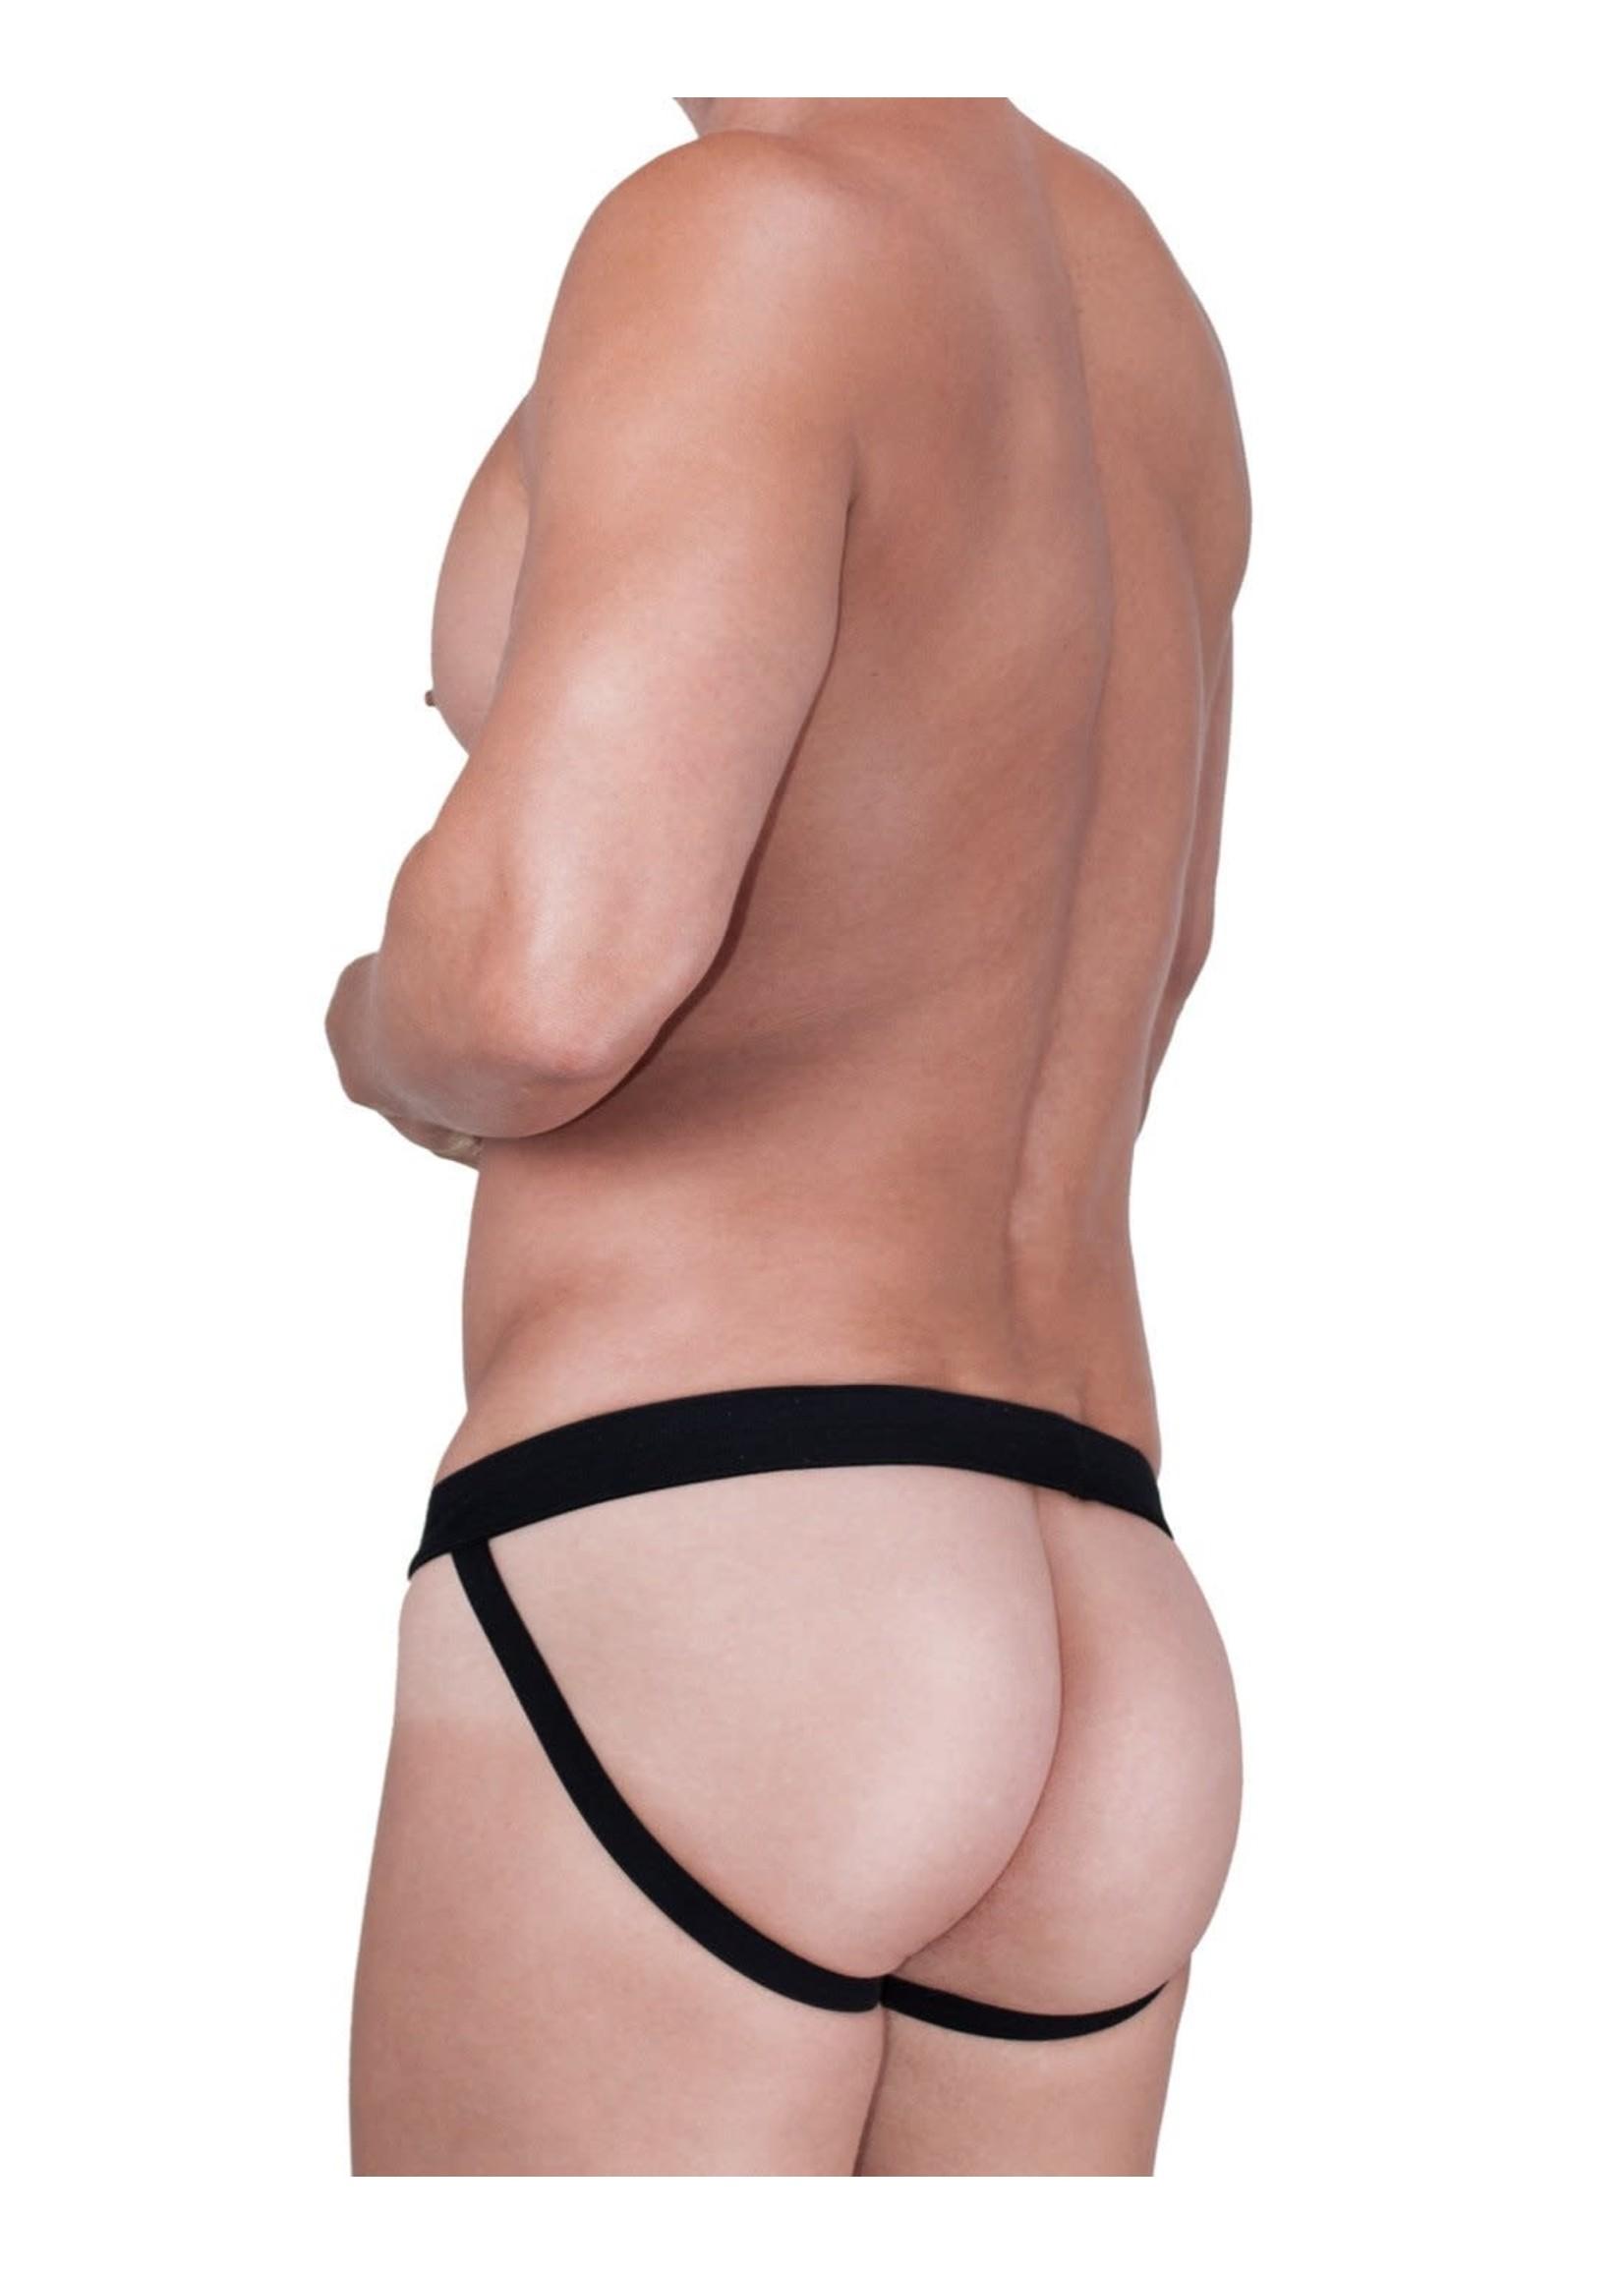 WildmanT WildmanT Raw Sport Stripe Jockstrap with Duraband Waistband